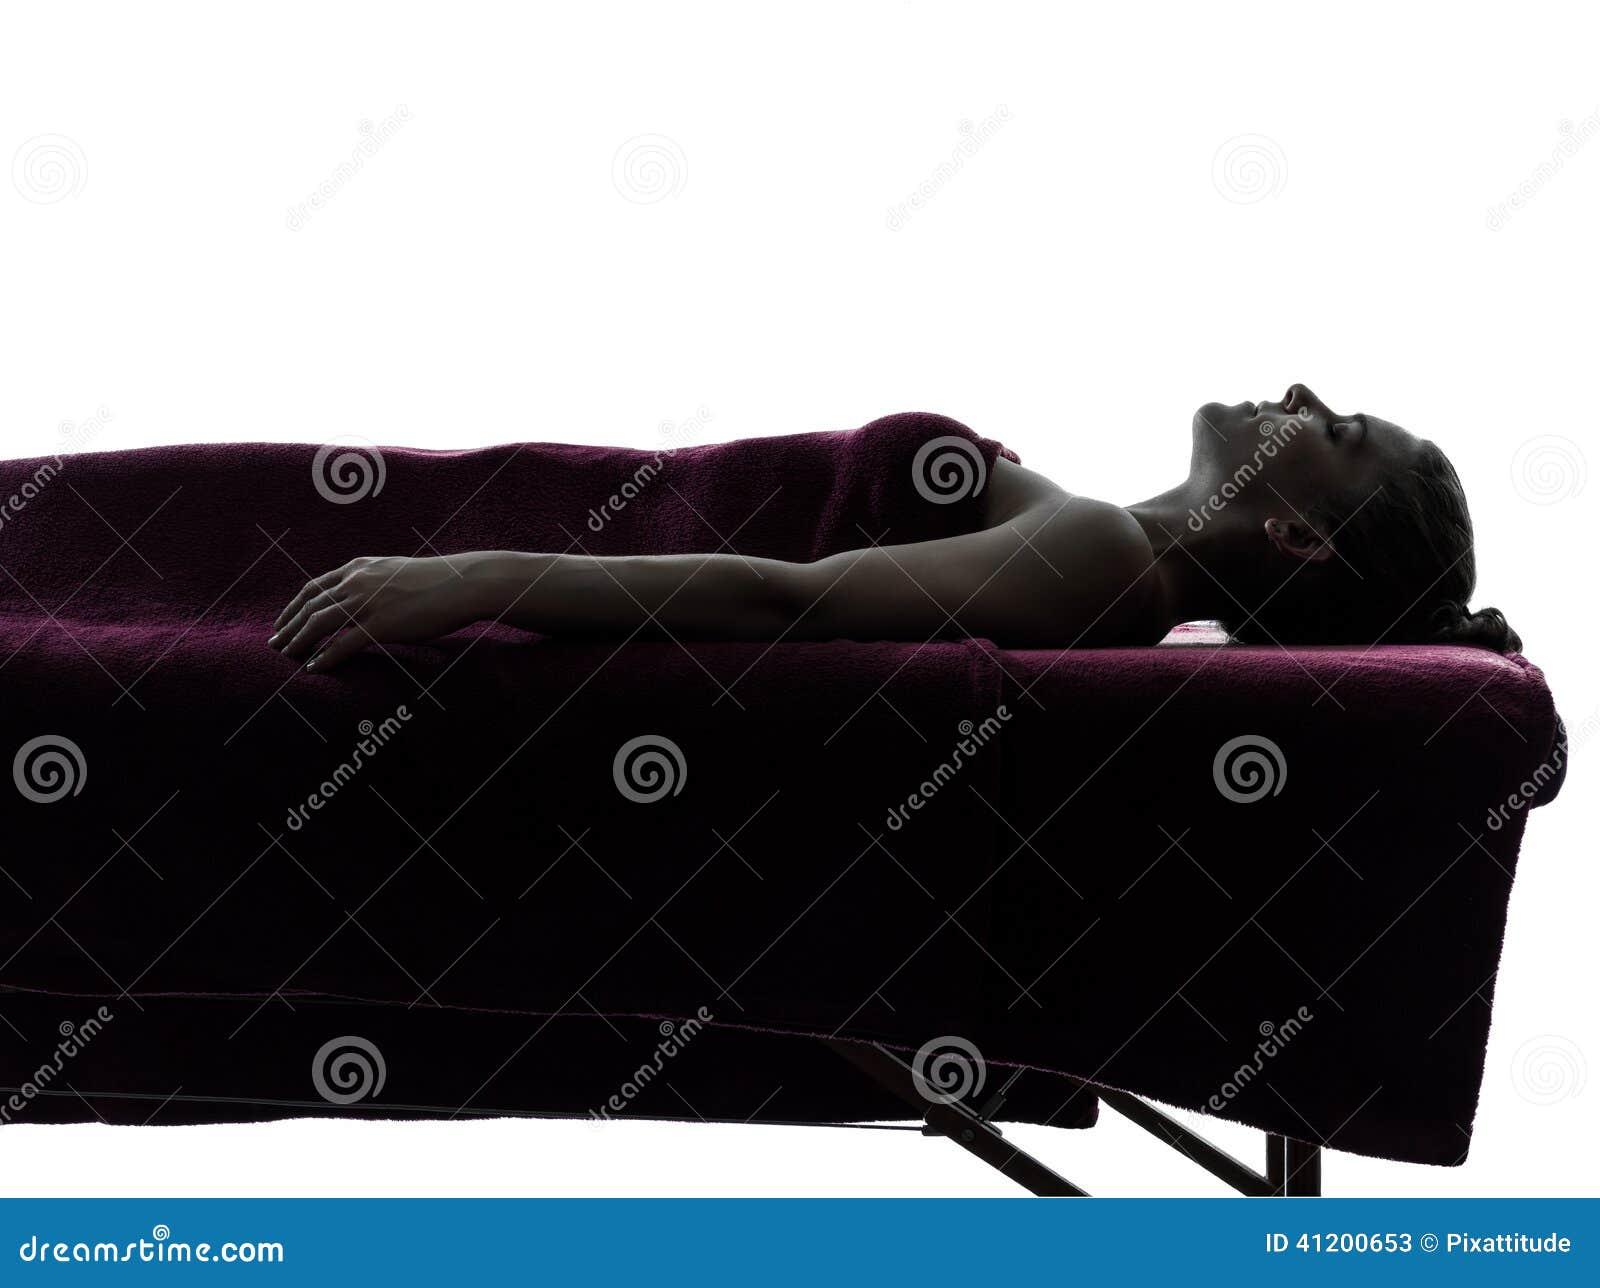 Woman Massage Therapy Silhouette Stock Photo